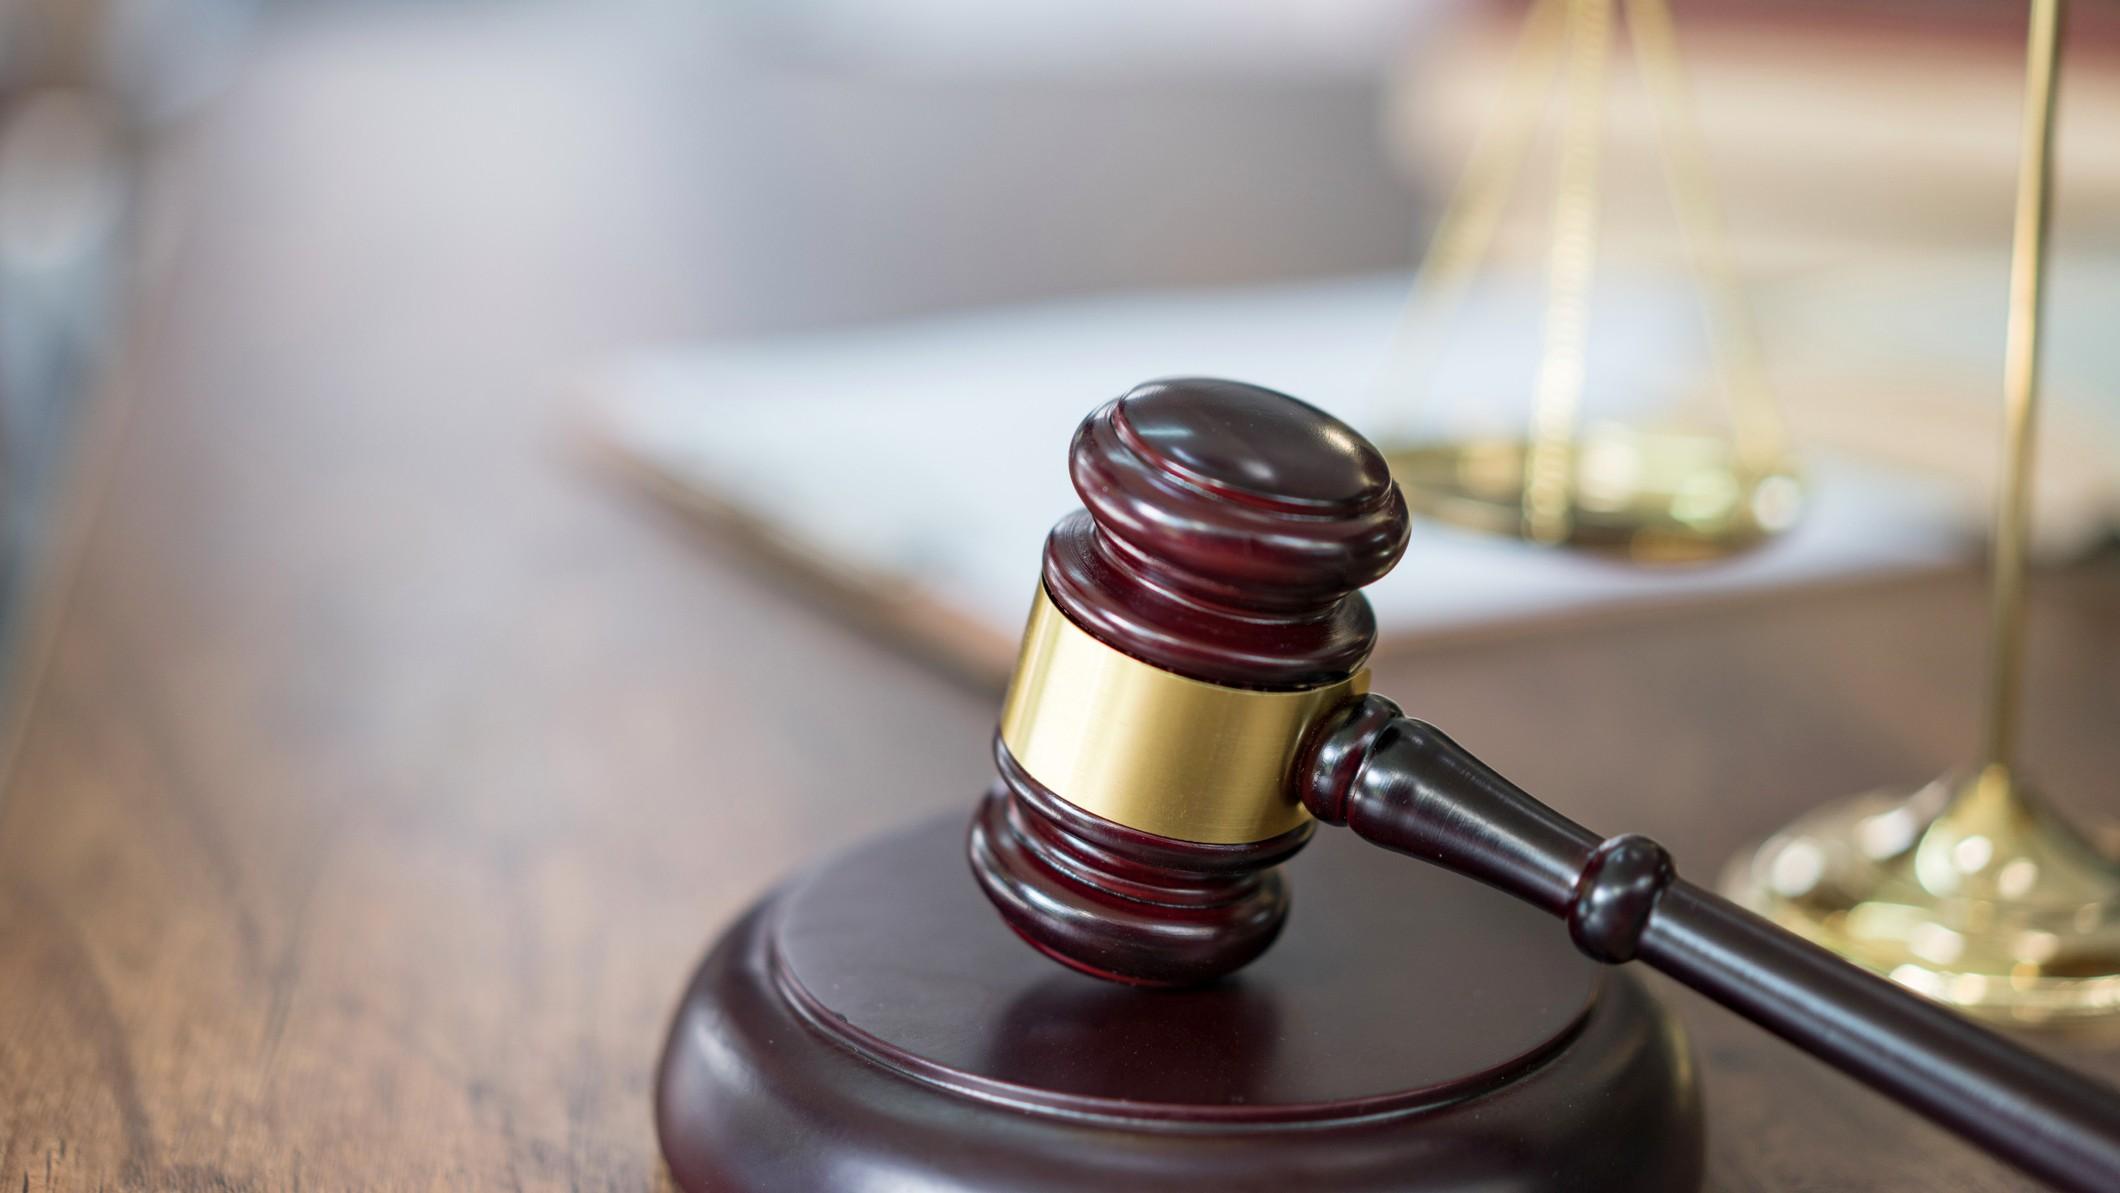 Pharmacy Exec Pleads Guilty in $50M Drug Fraud Scam Targeting NJ's Public Workers